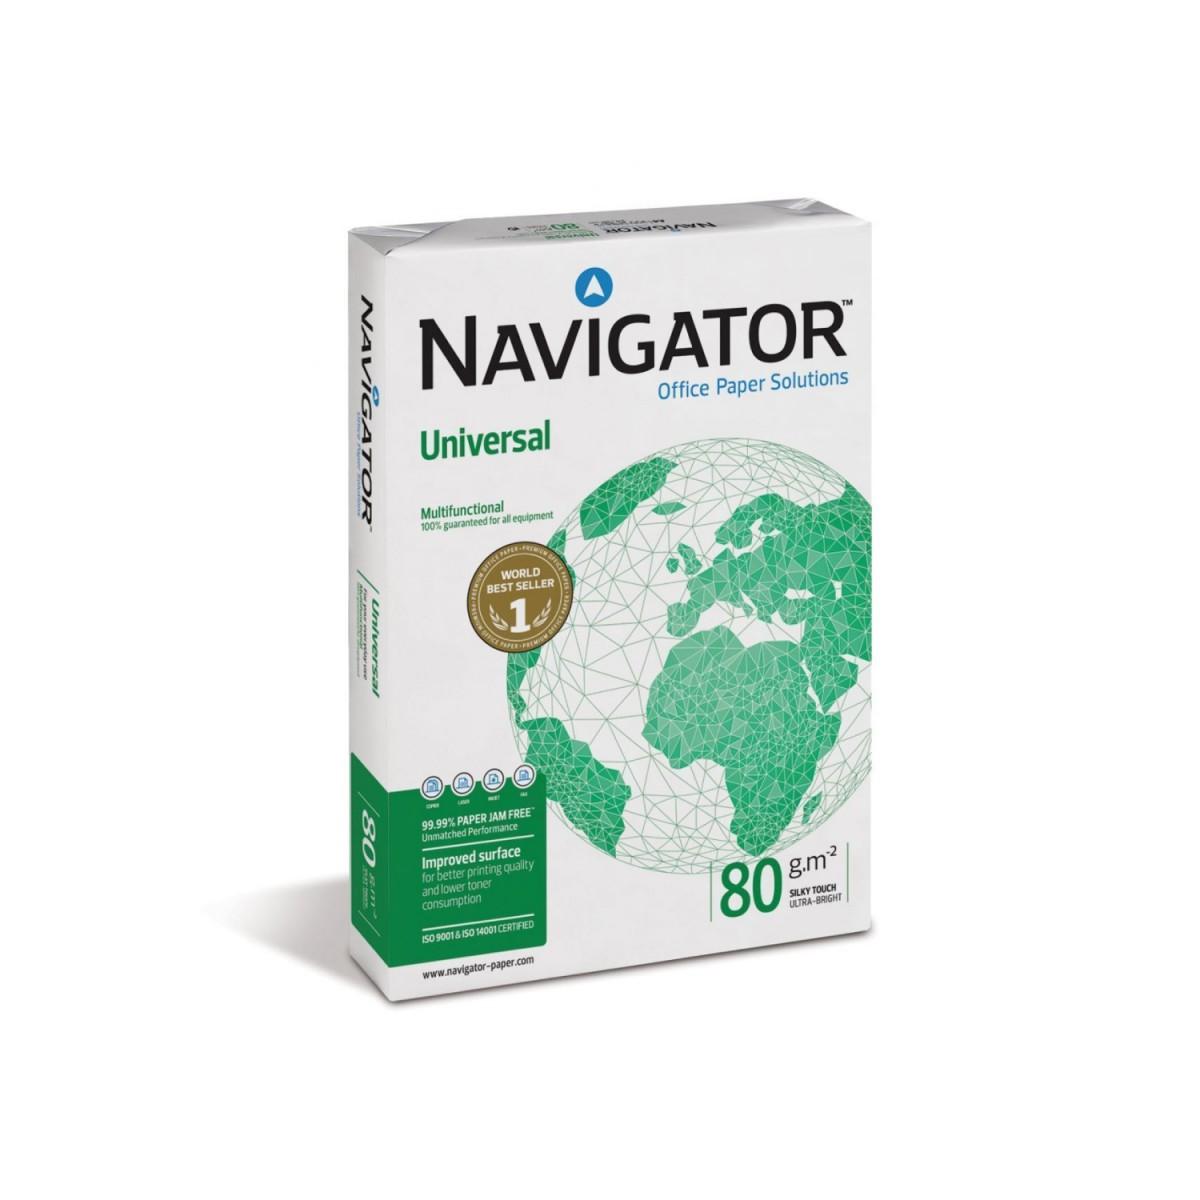 Navigatör A4 500 Lü 80 Gr Fotokopi Kağıdı